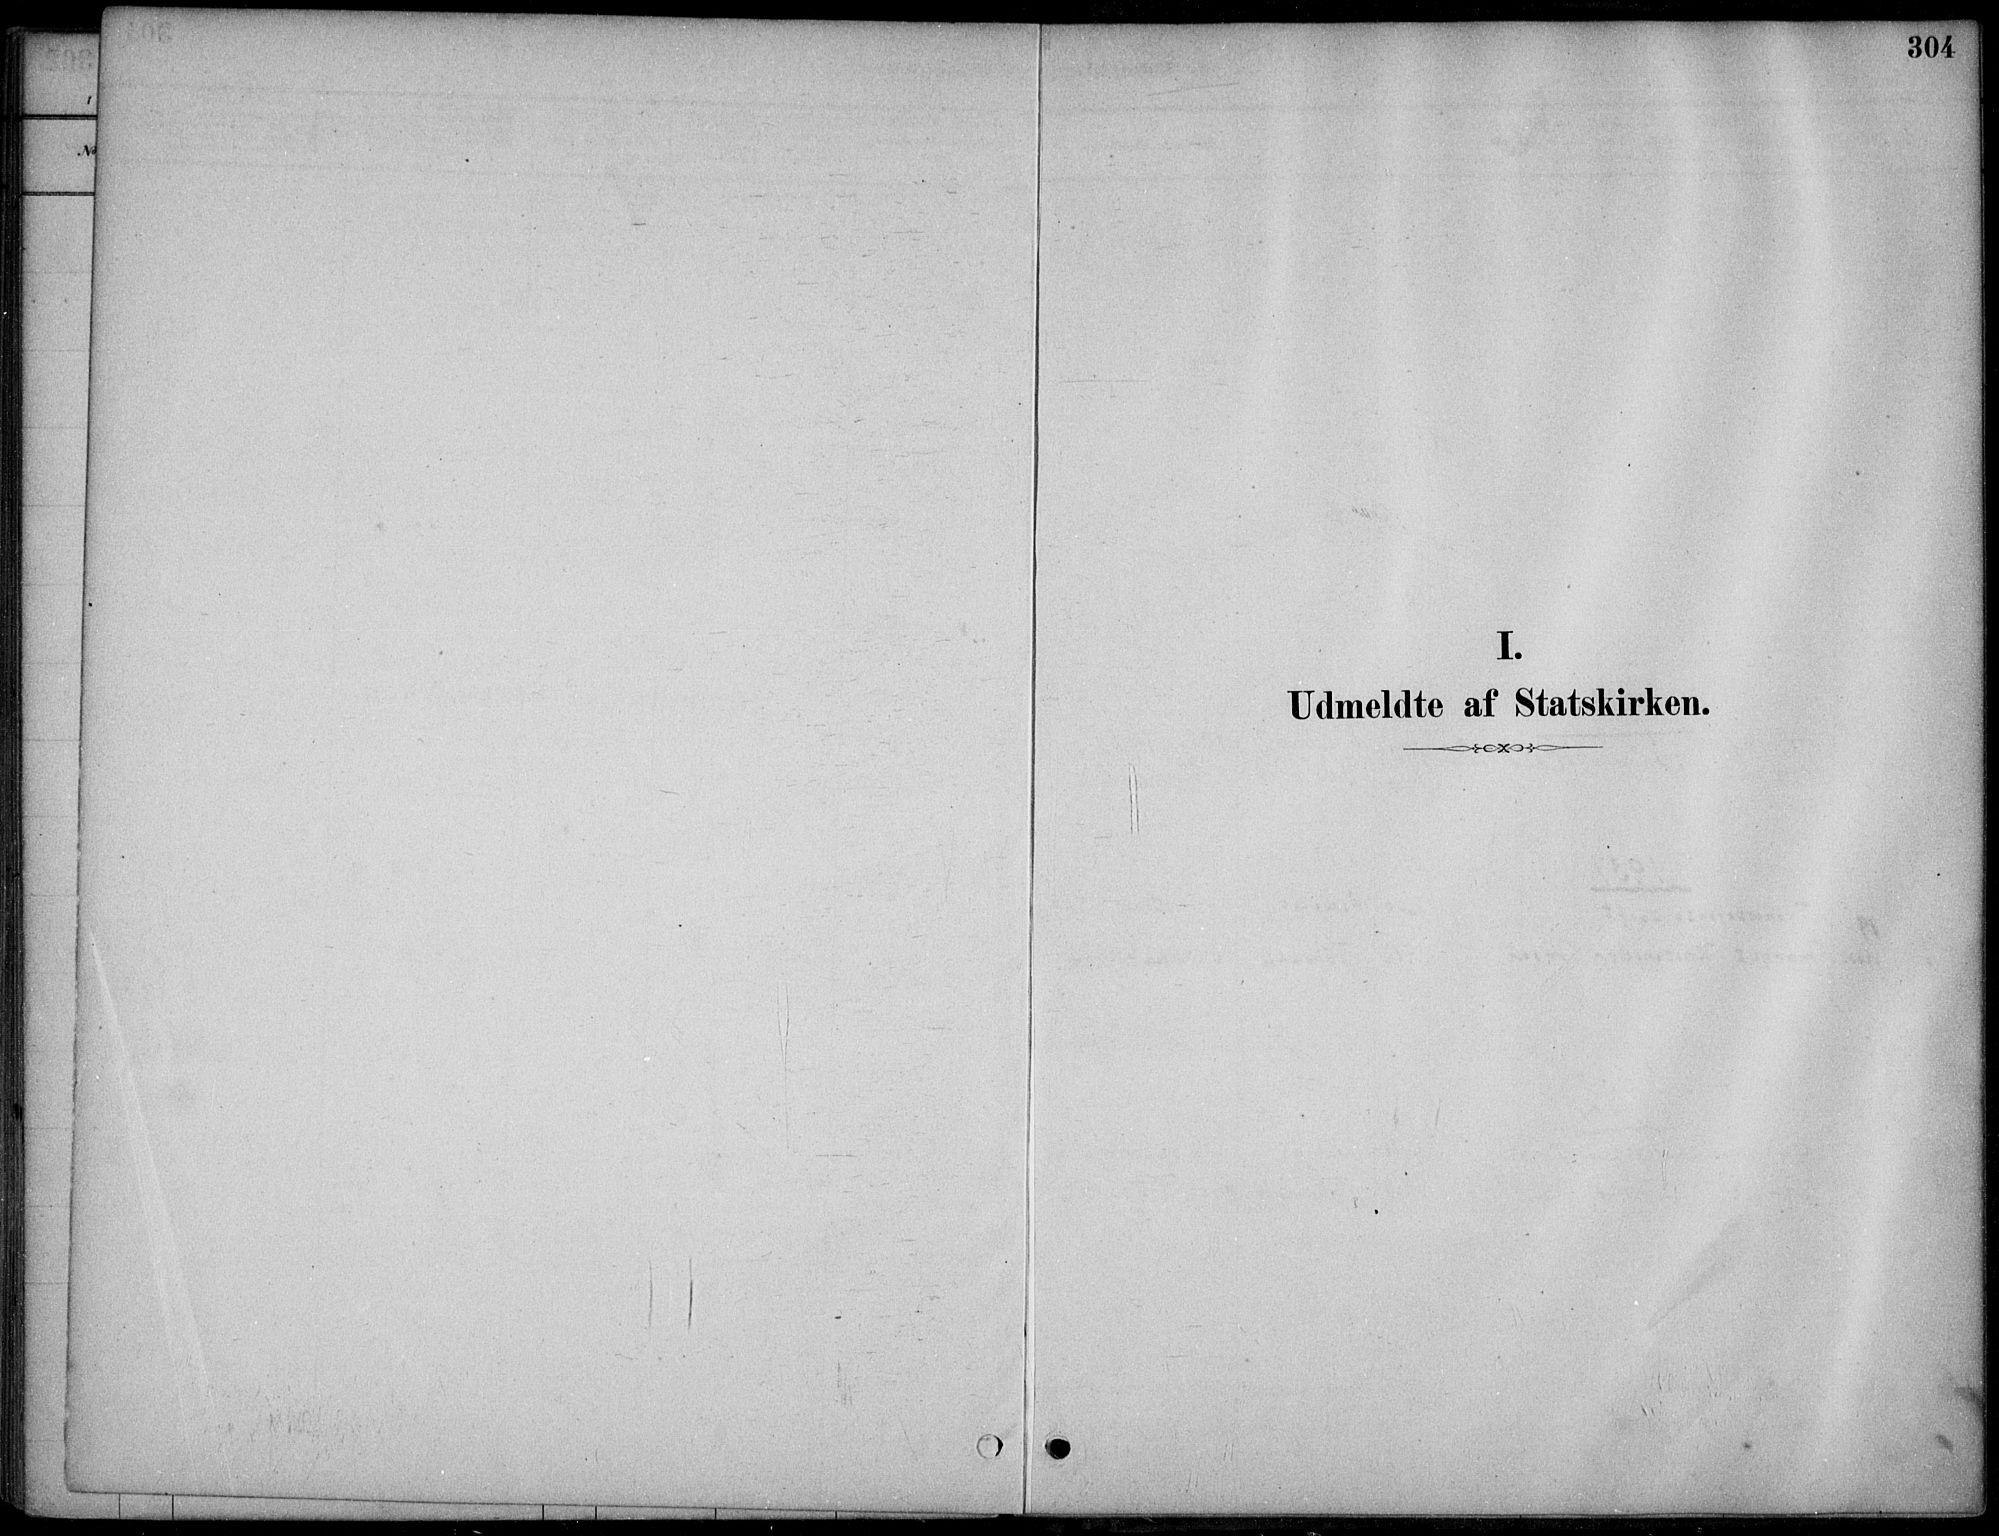 SAKO, Hjartdal kirkebøker, F/Fc/L0002: Ministerialbok nr. III 2, 1880-1936, s. 304